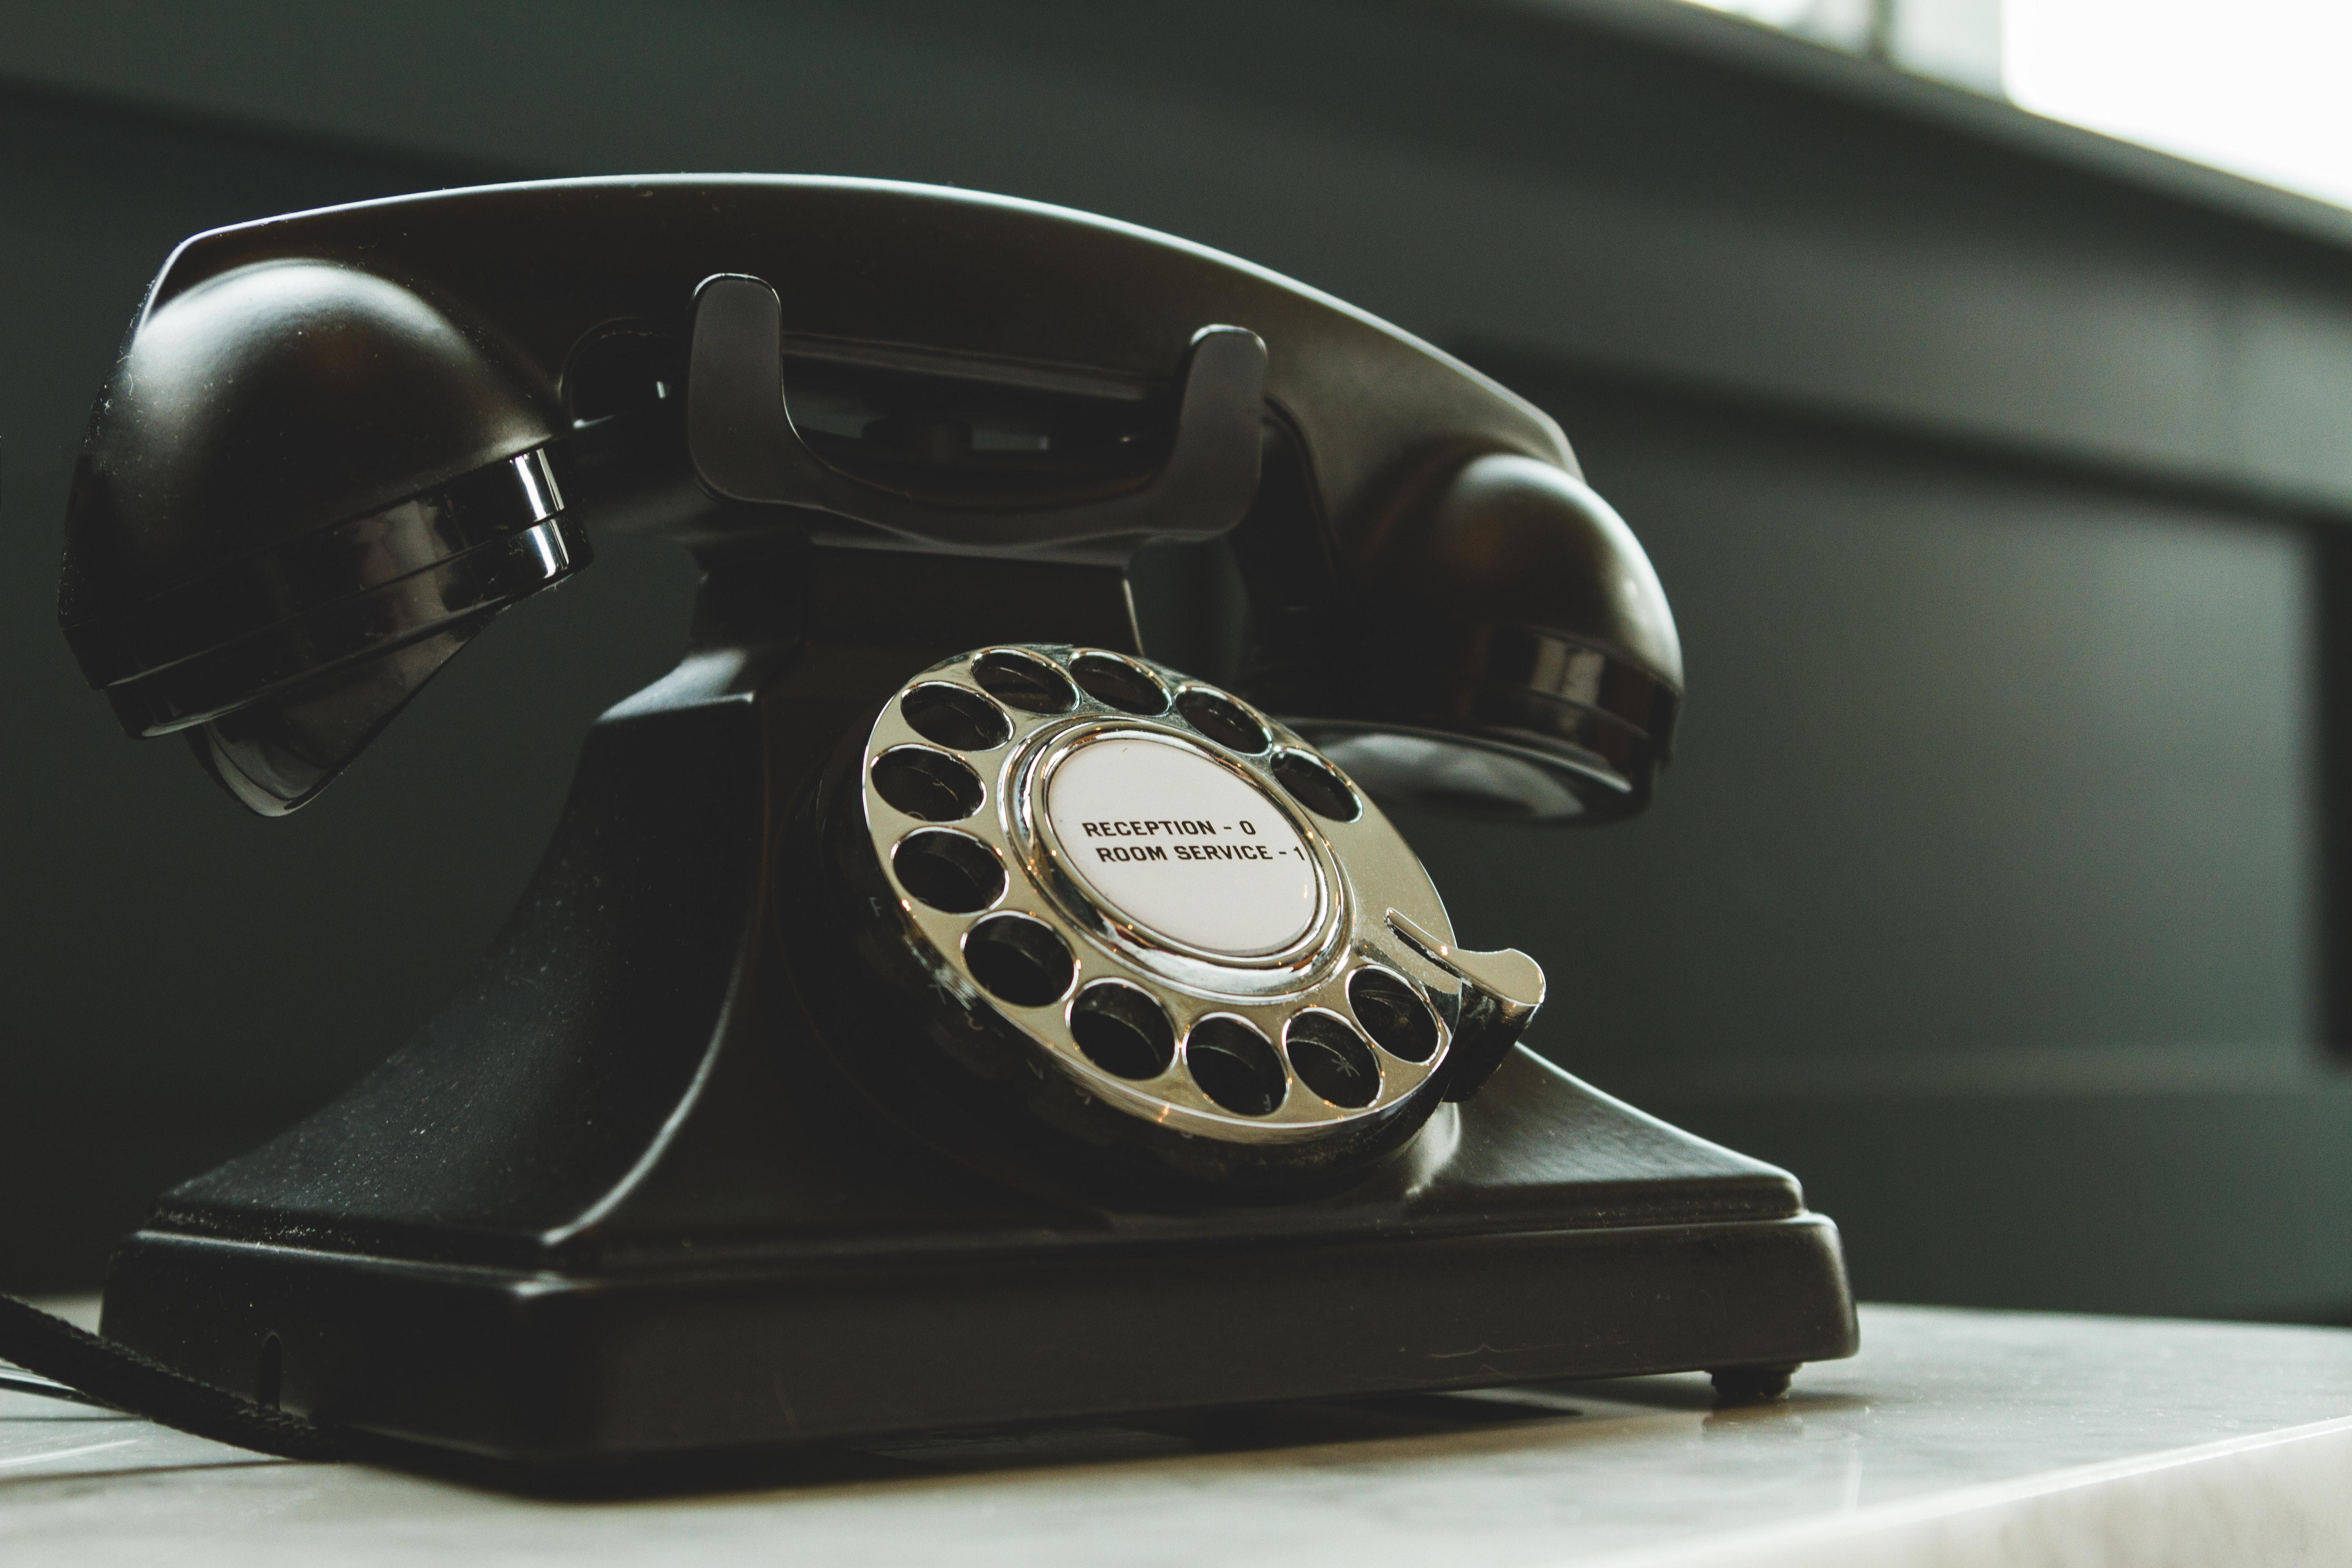 black-rotary-telephone-on-white-surface-1416530